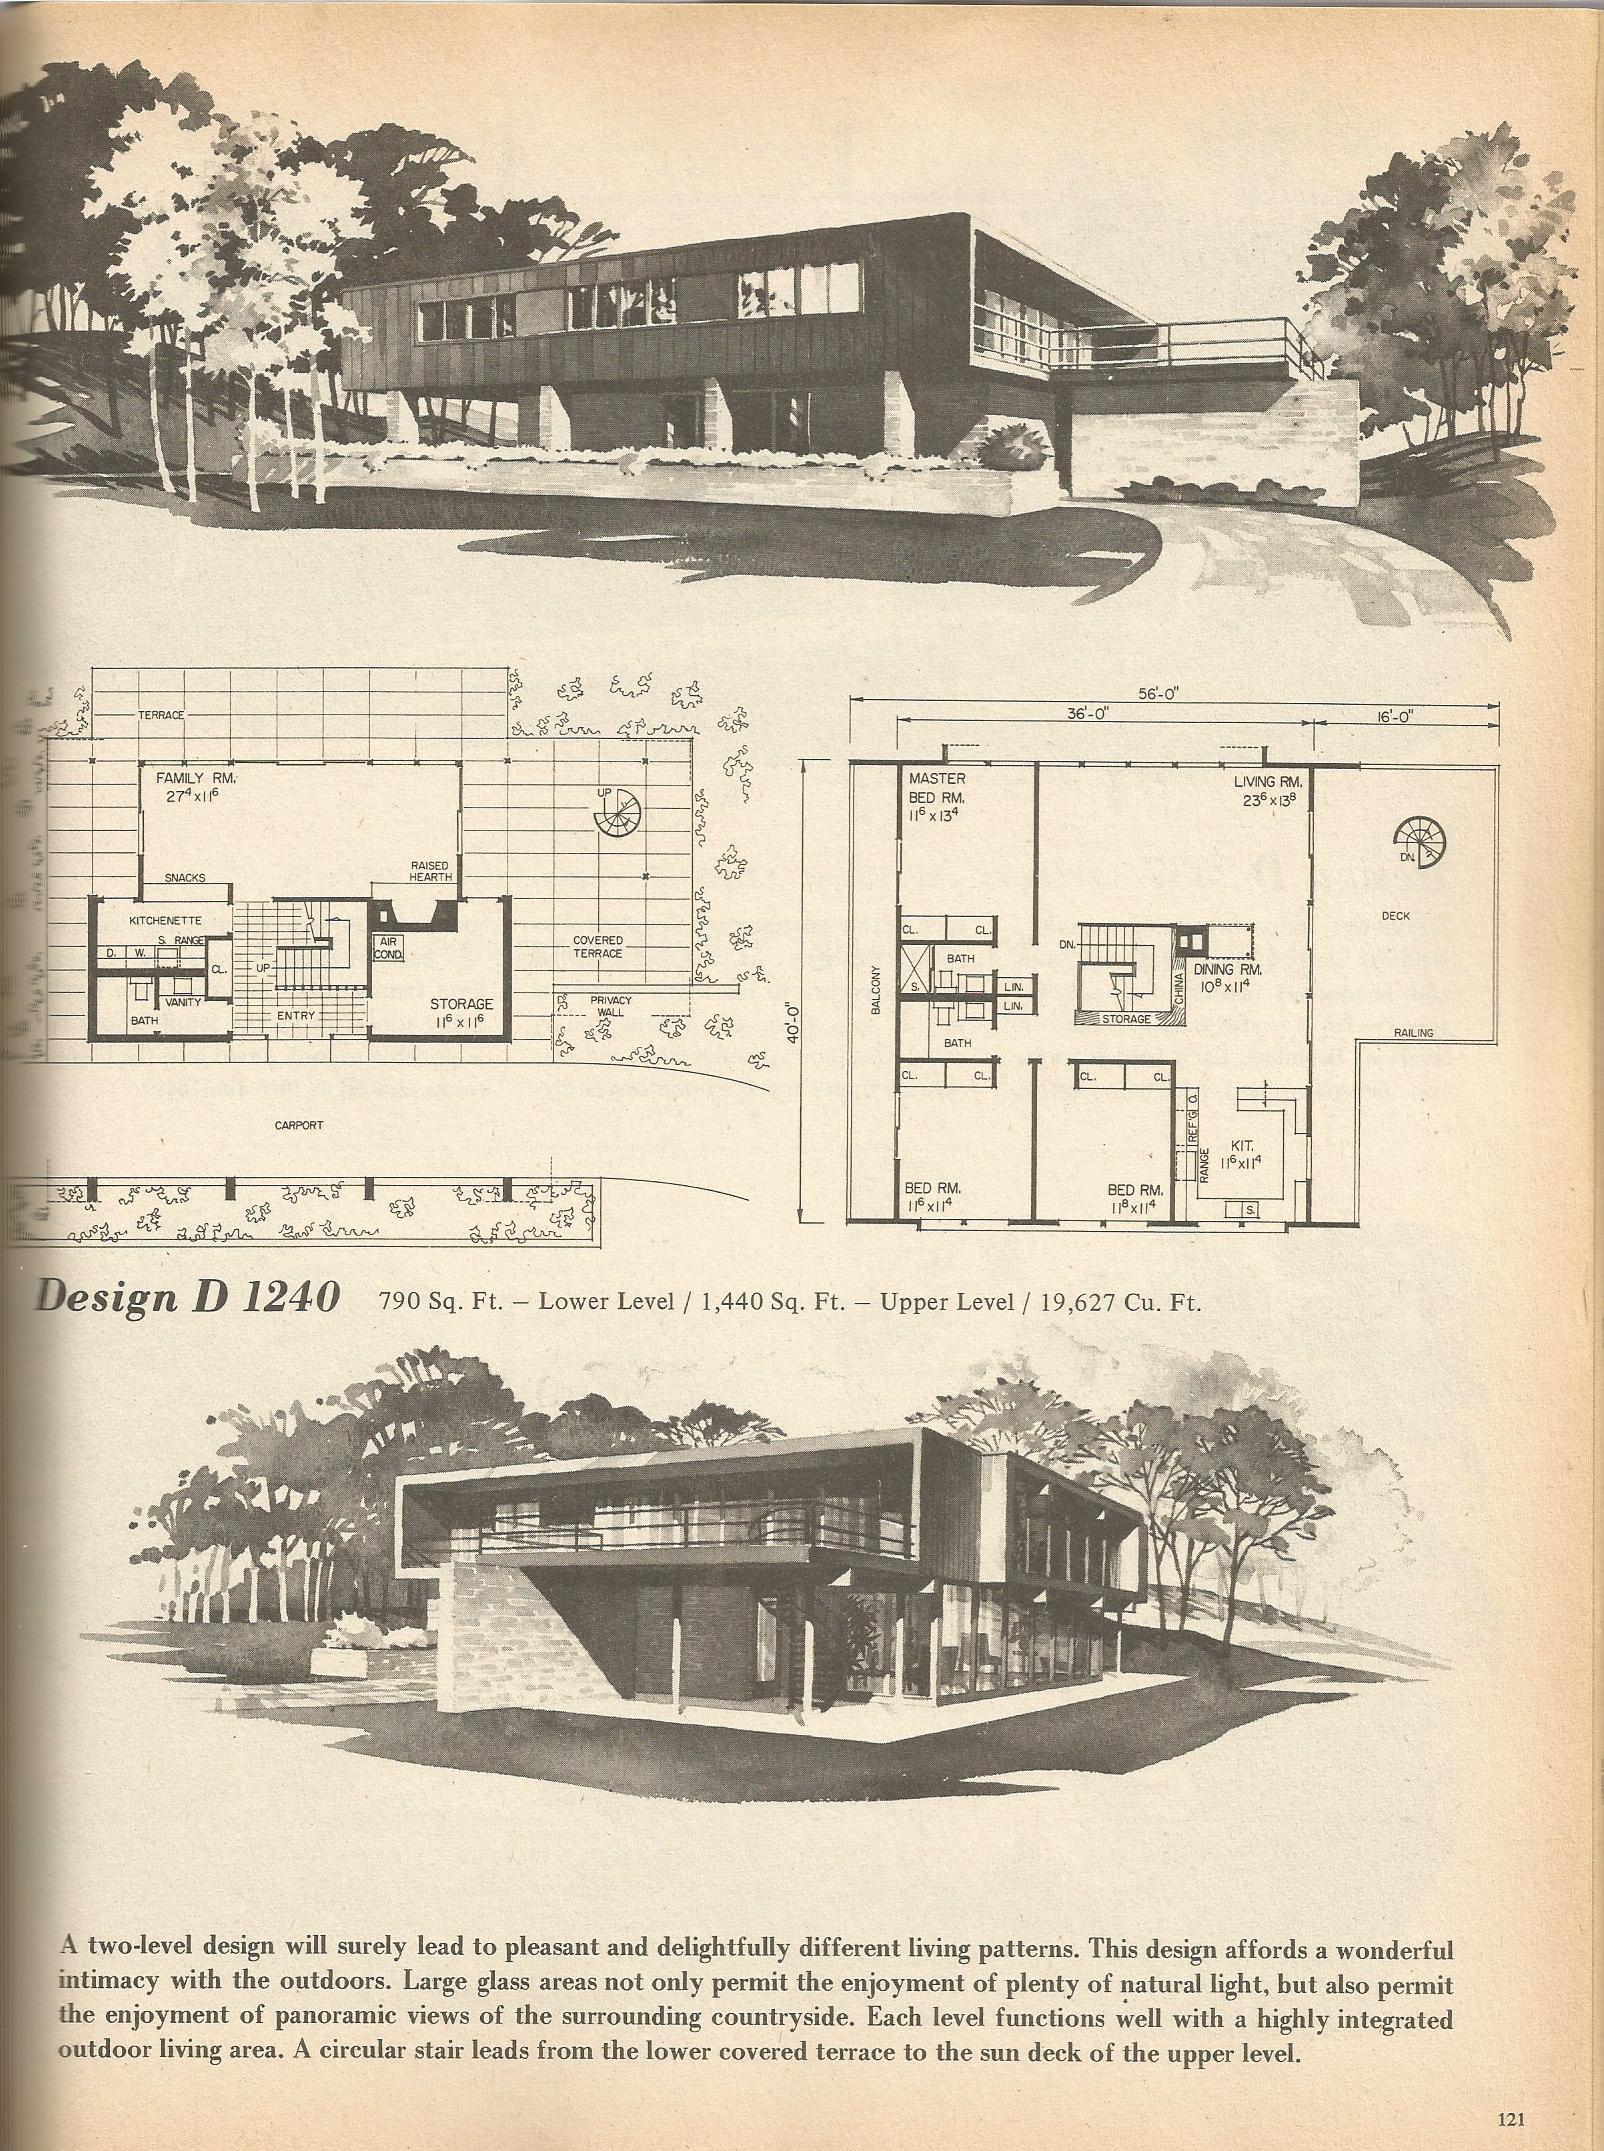 Vintage house plans 1240 antique alter ego for Retro home designs